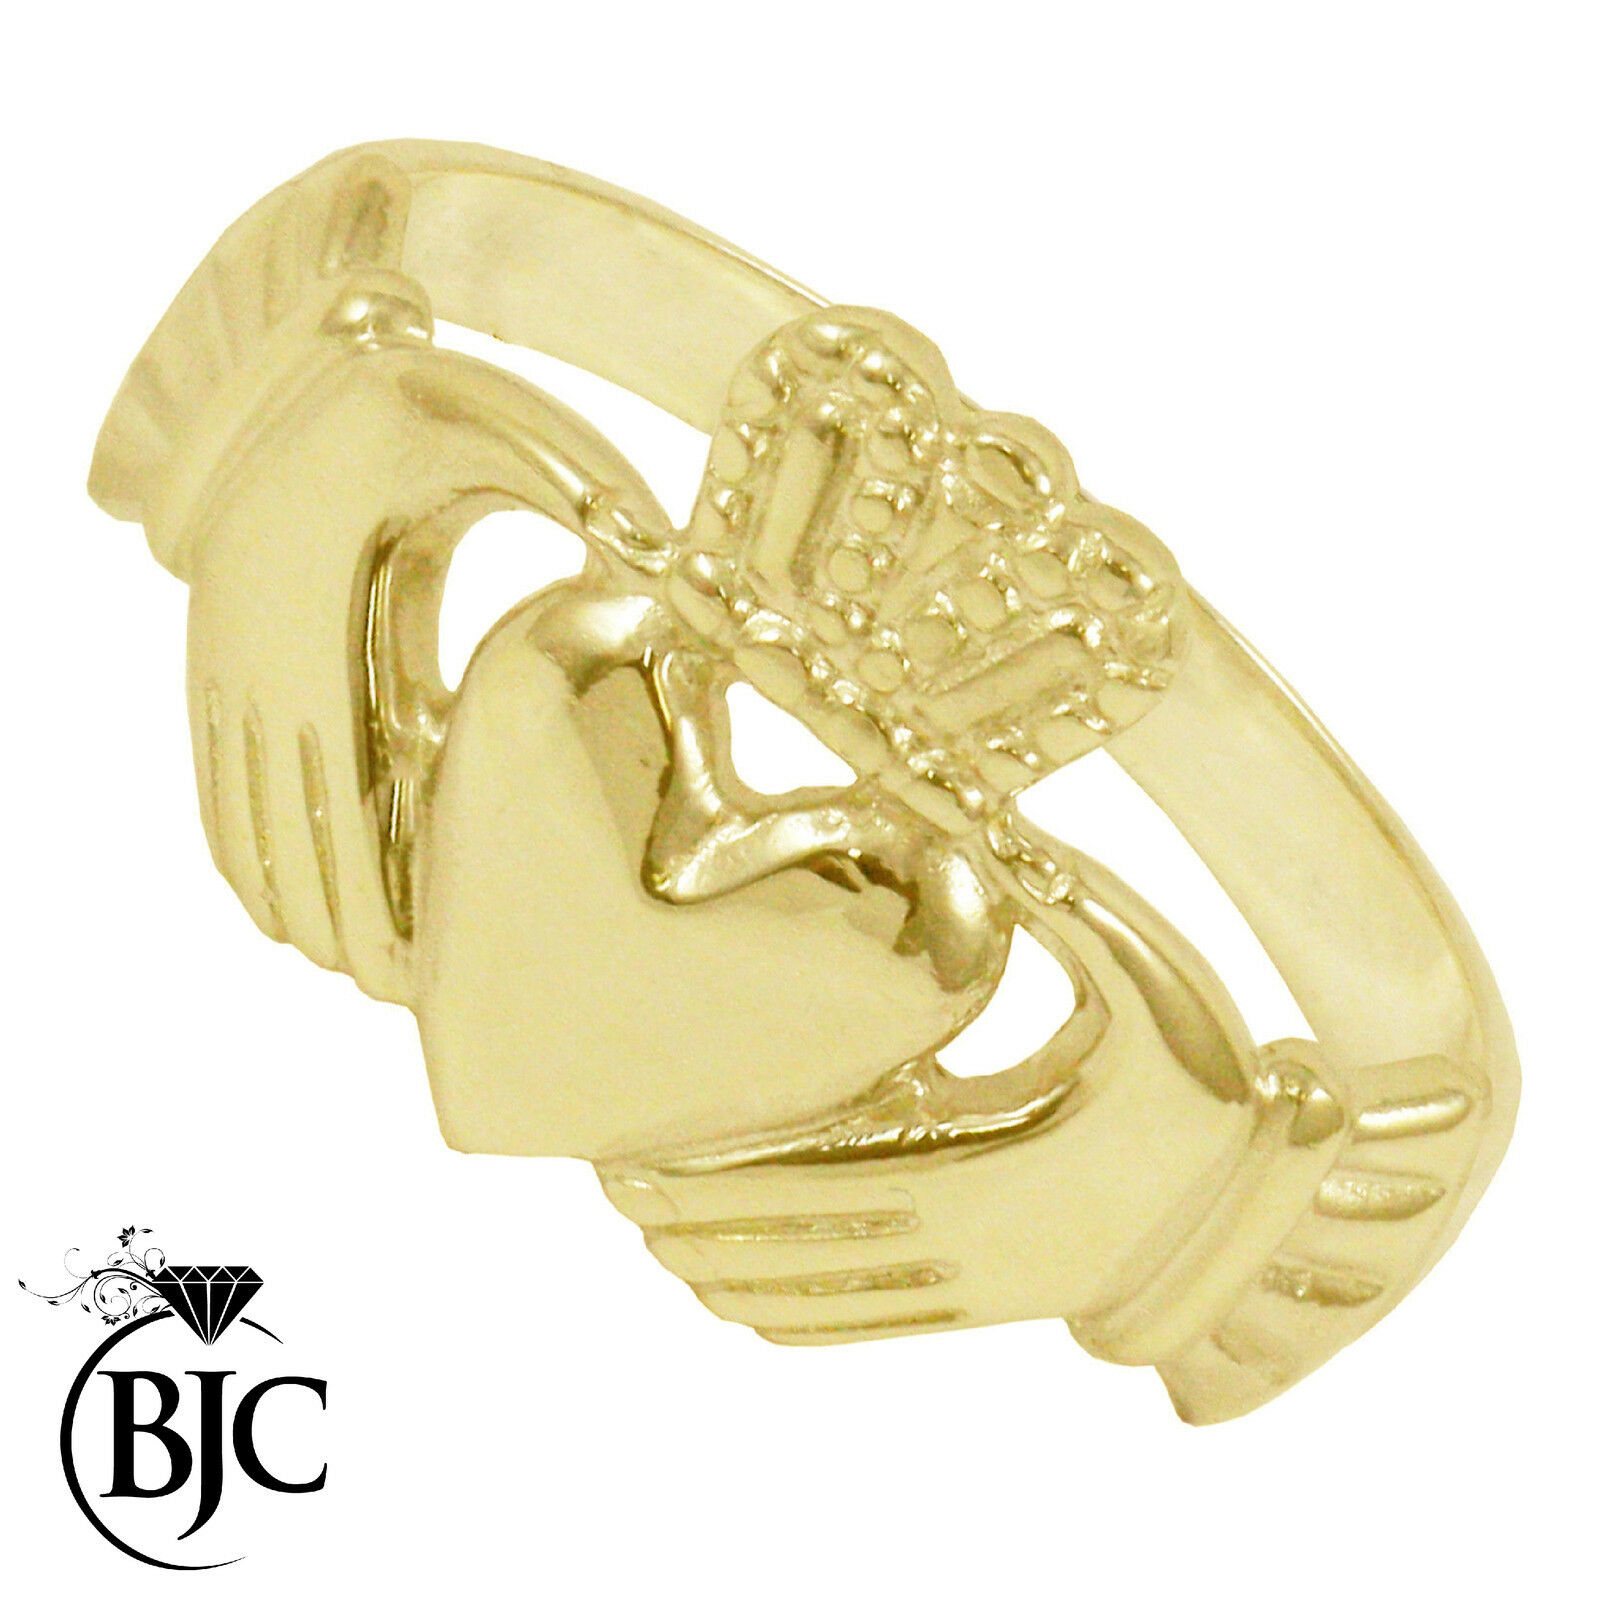 BJC 9 ct gold yellow Claddagh Irlandés Anillo Hombre Múltiples Tamaños